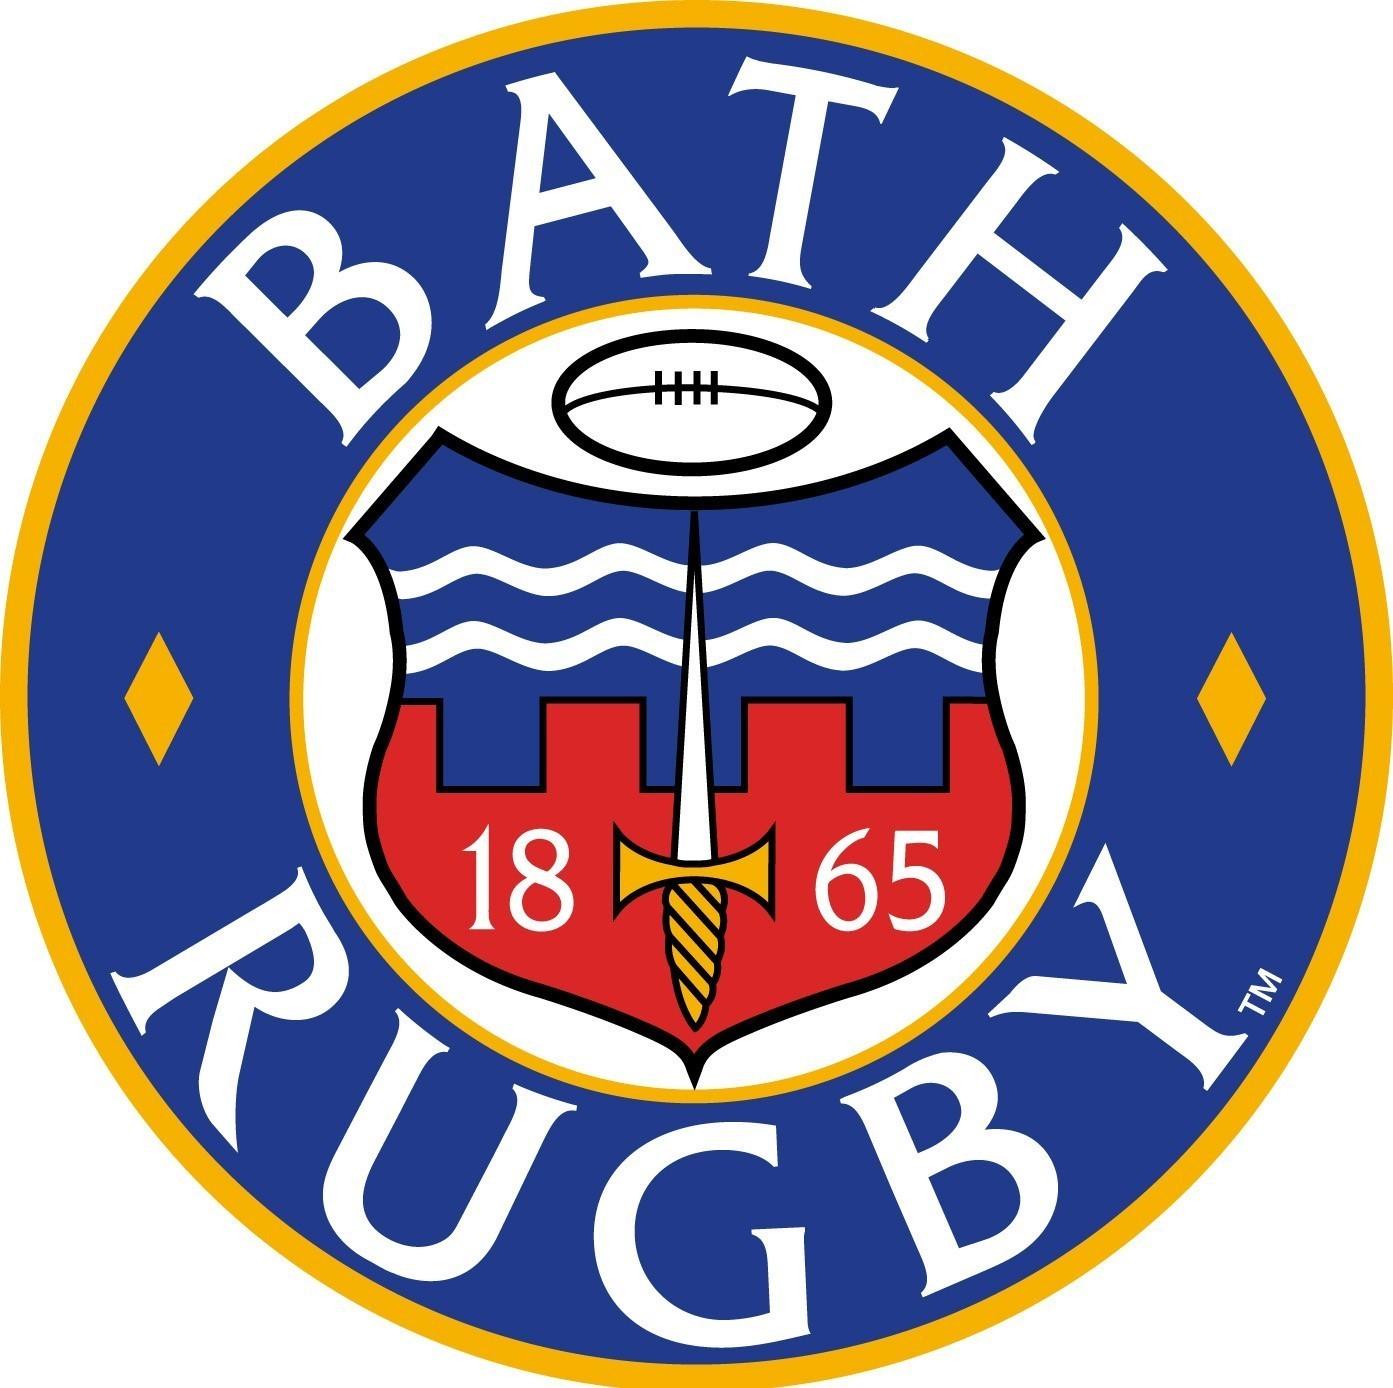 Pin rugby logos all blacks hd wallpaper companies on pinterest for Wallpaper companies